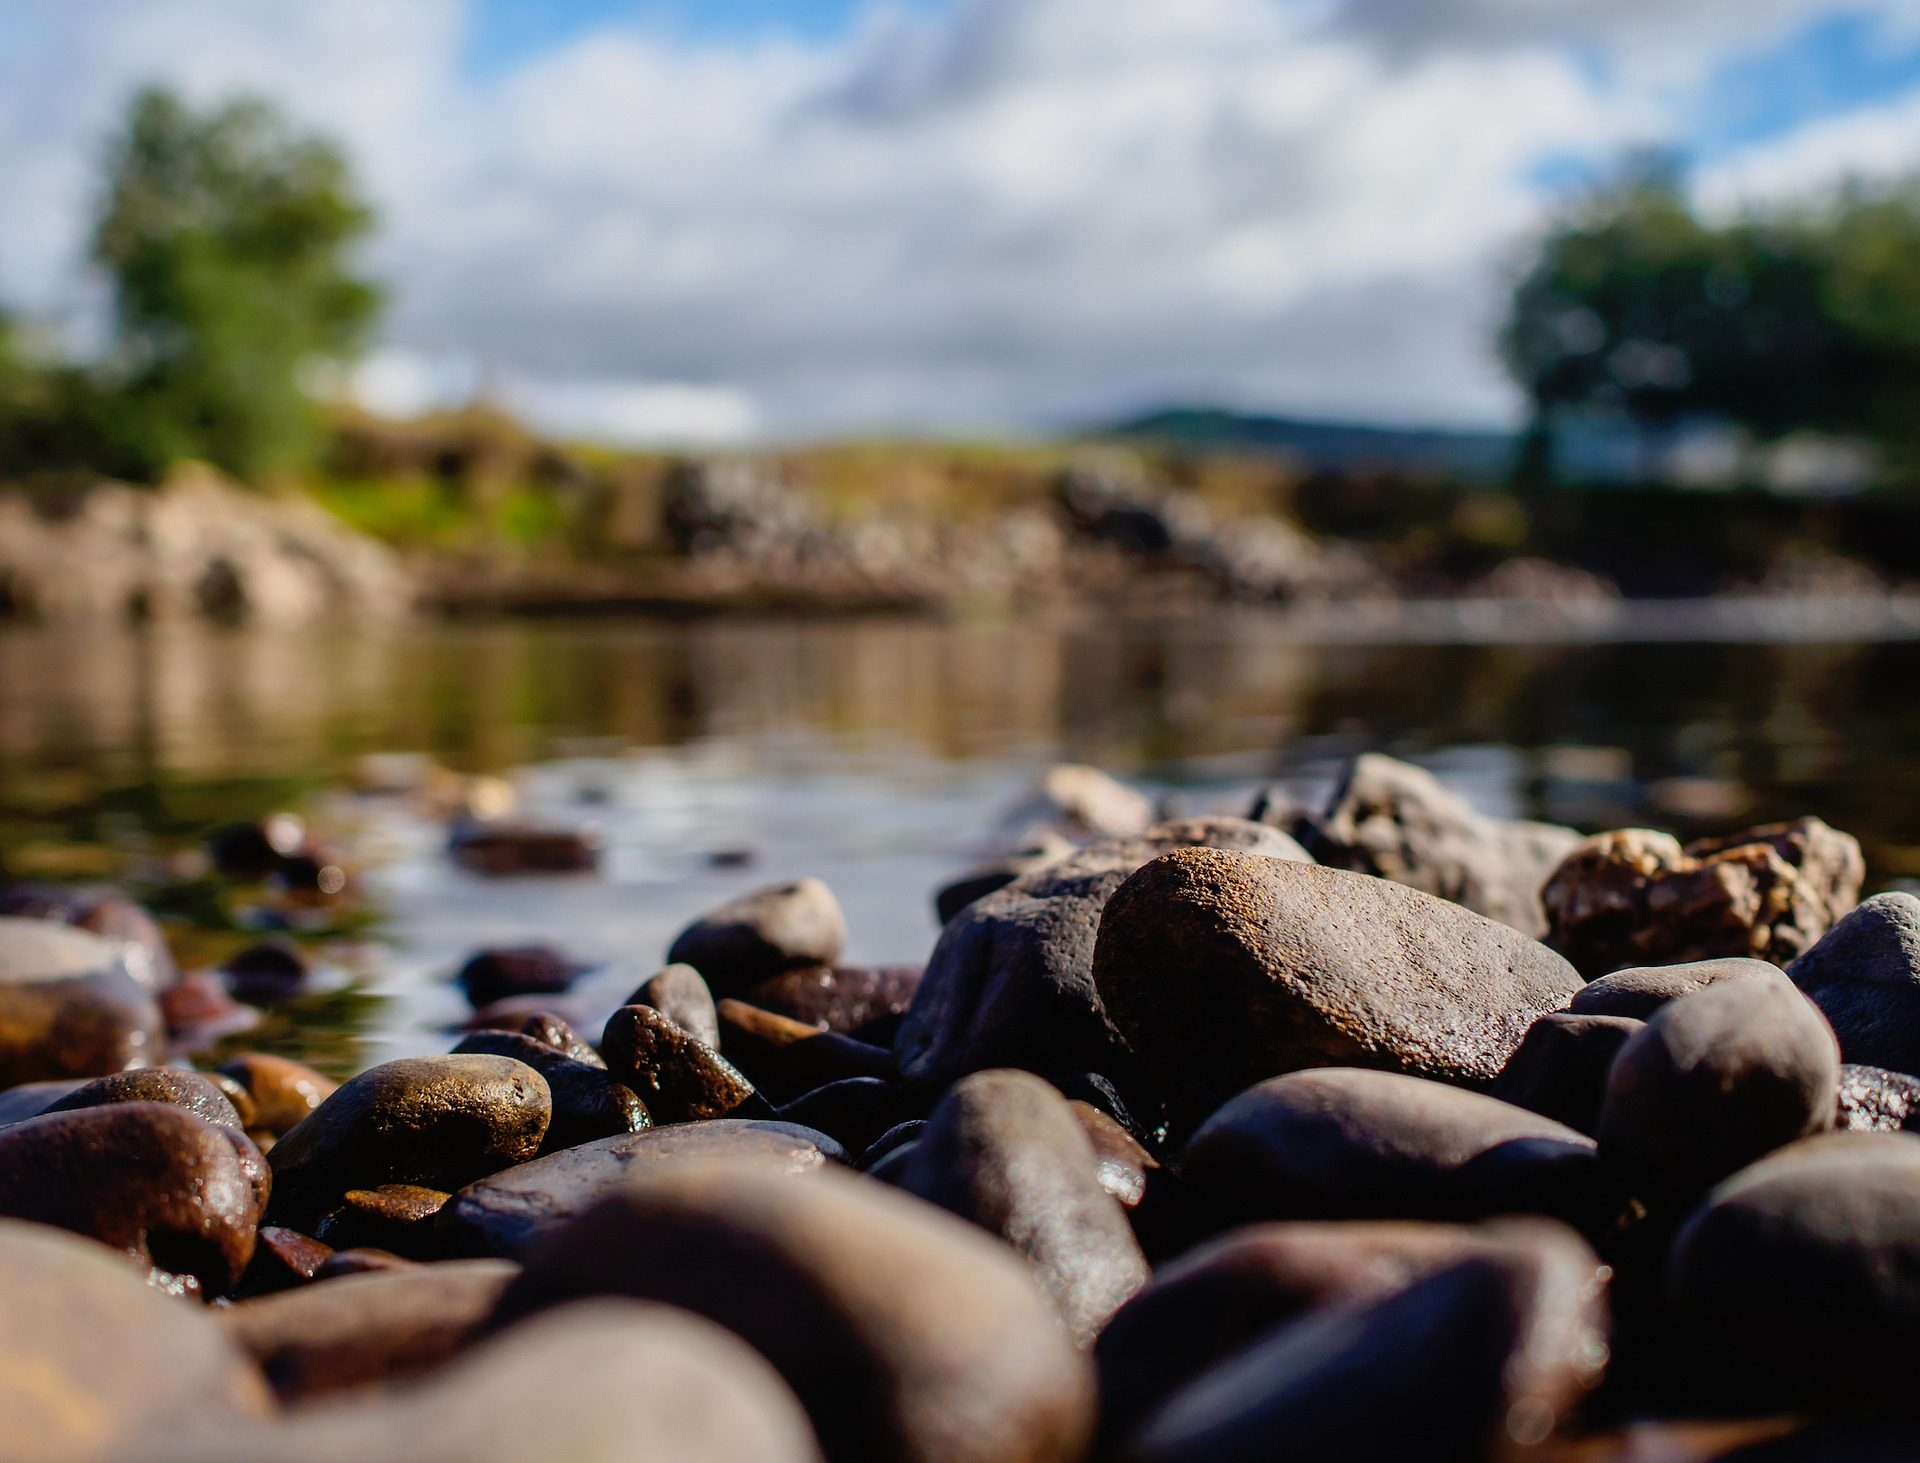 río, piedras, rocas, campo, agua, de cerca - Fondos de Pantalla HD - professor-falken.com